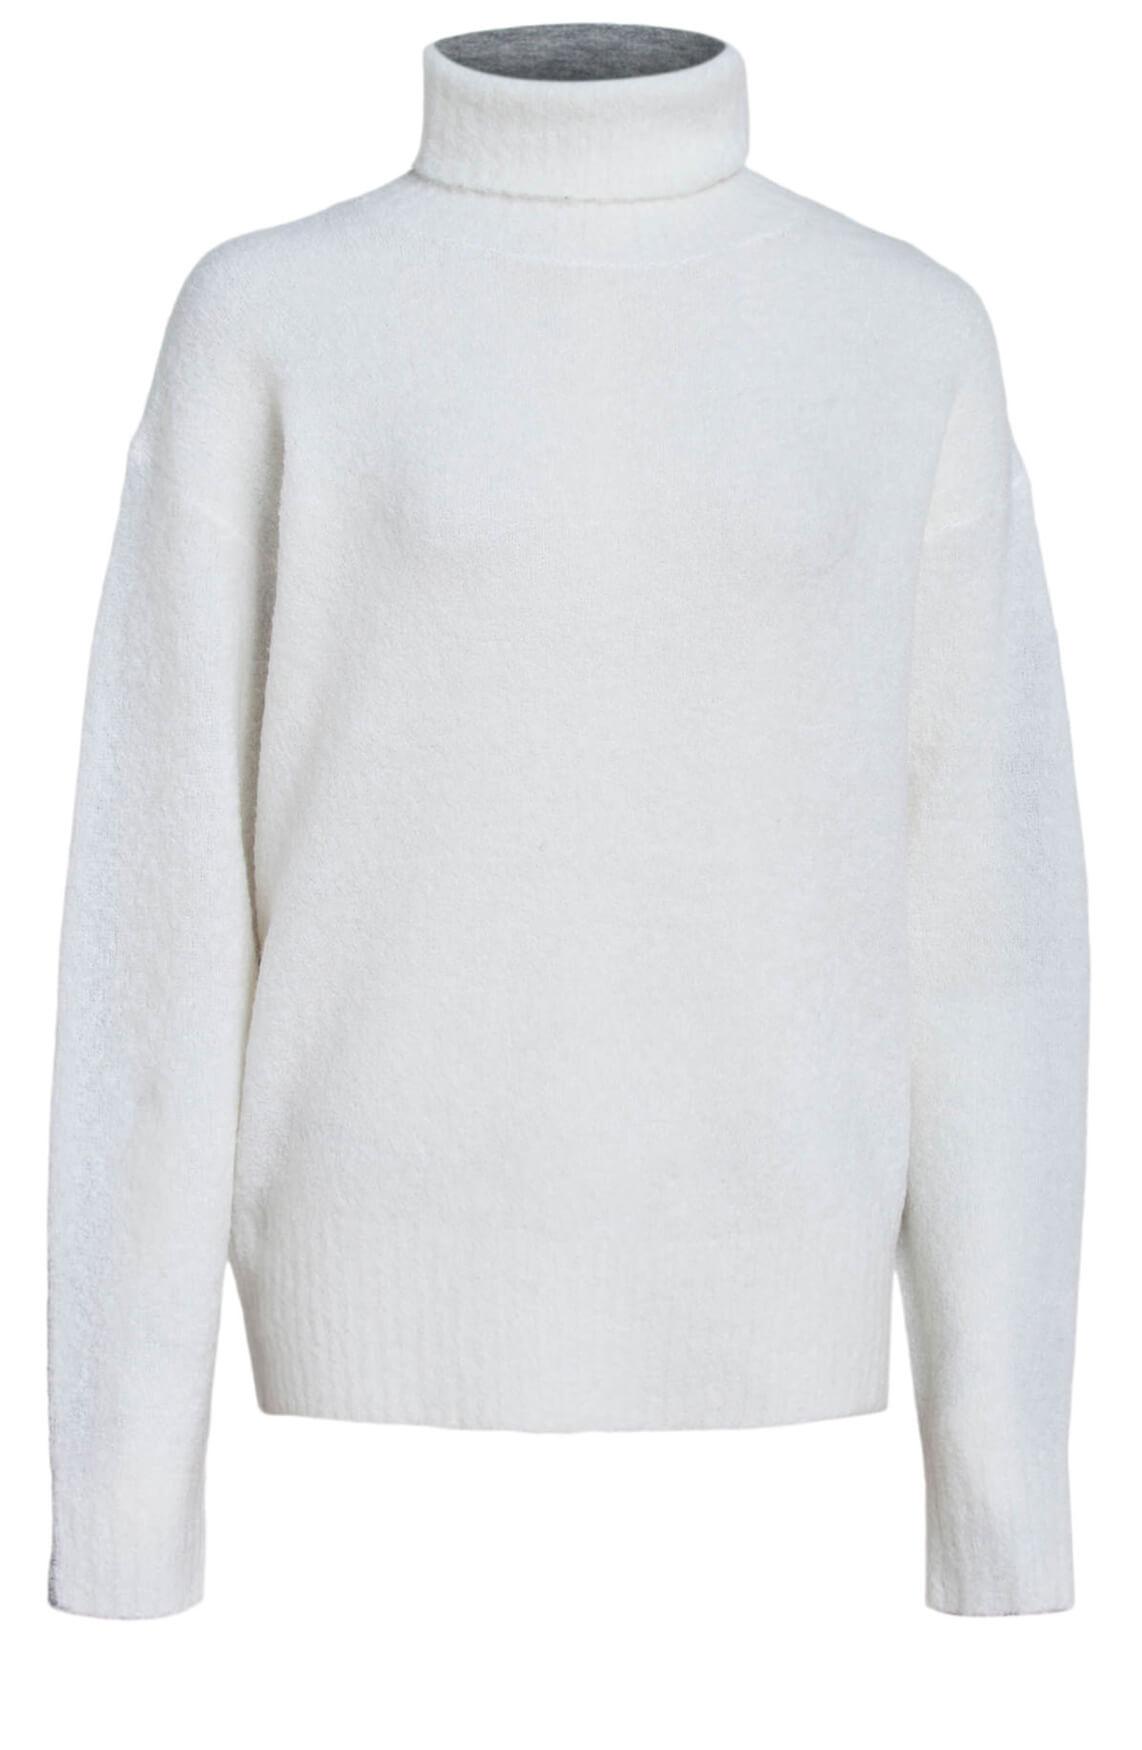 10 Days Dames Reversible sweater Grijs